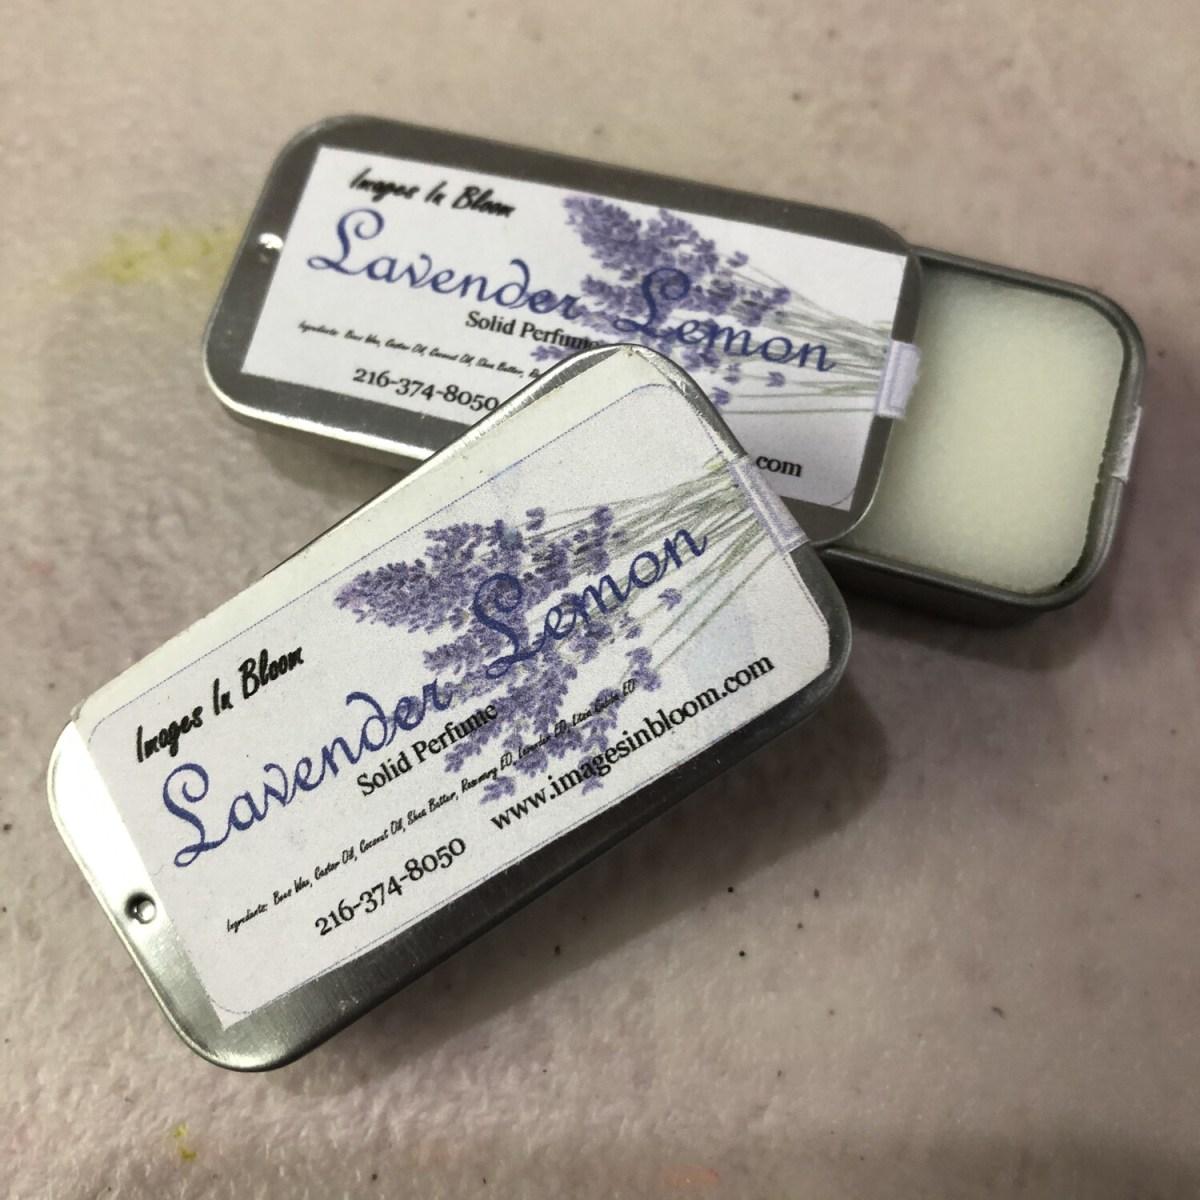 Lavender Lemon Solid Perfume